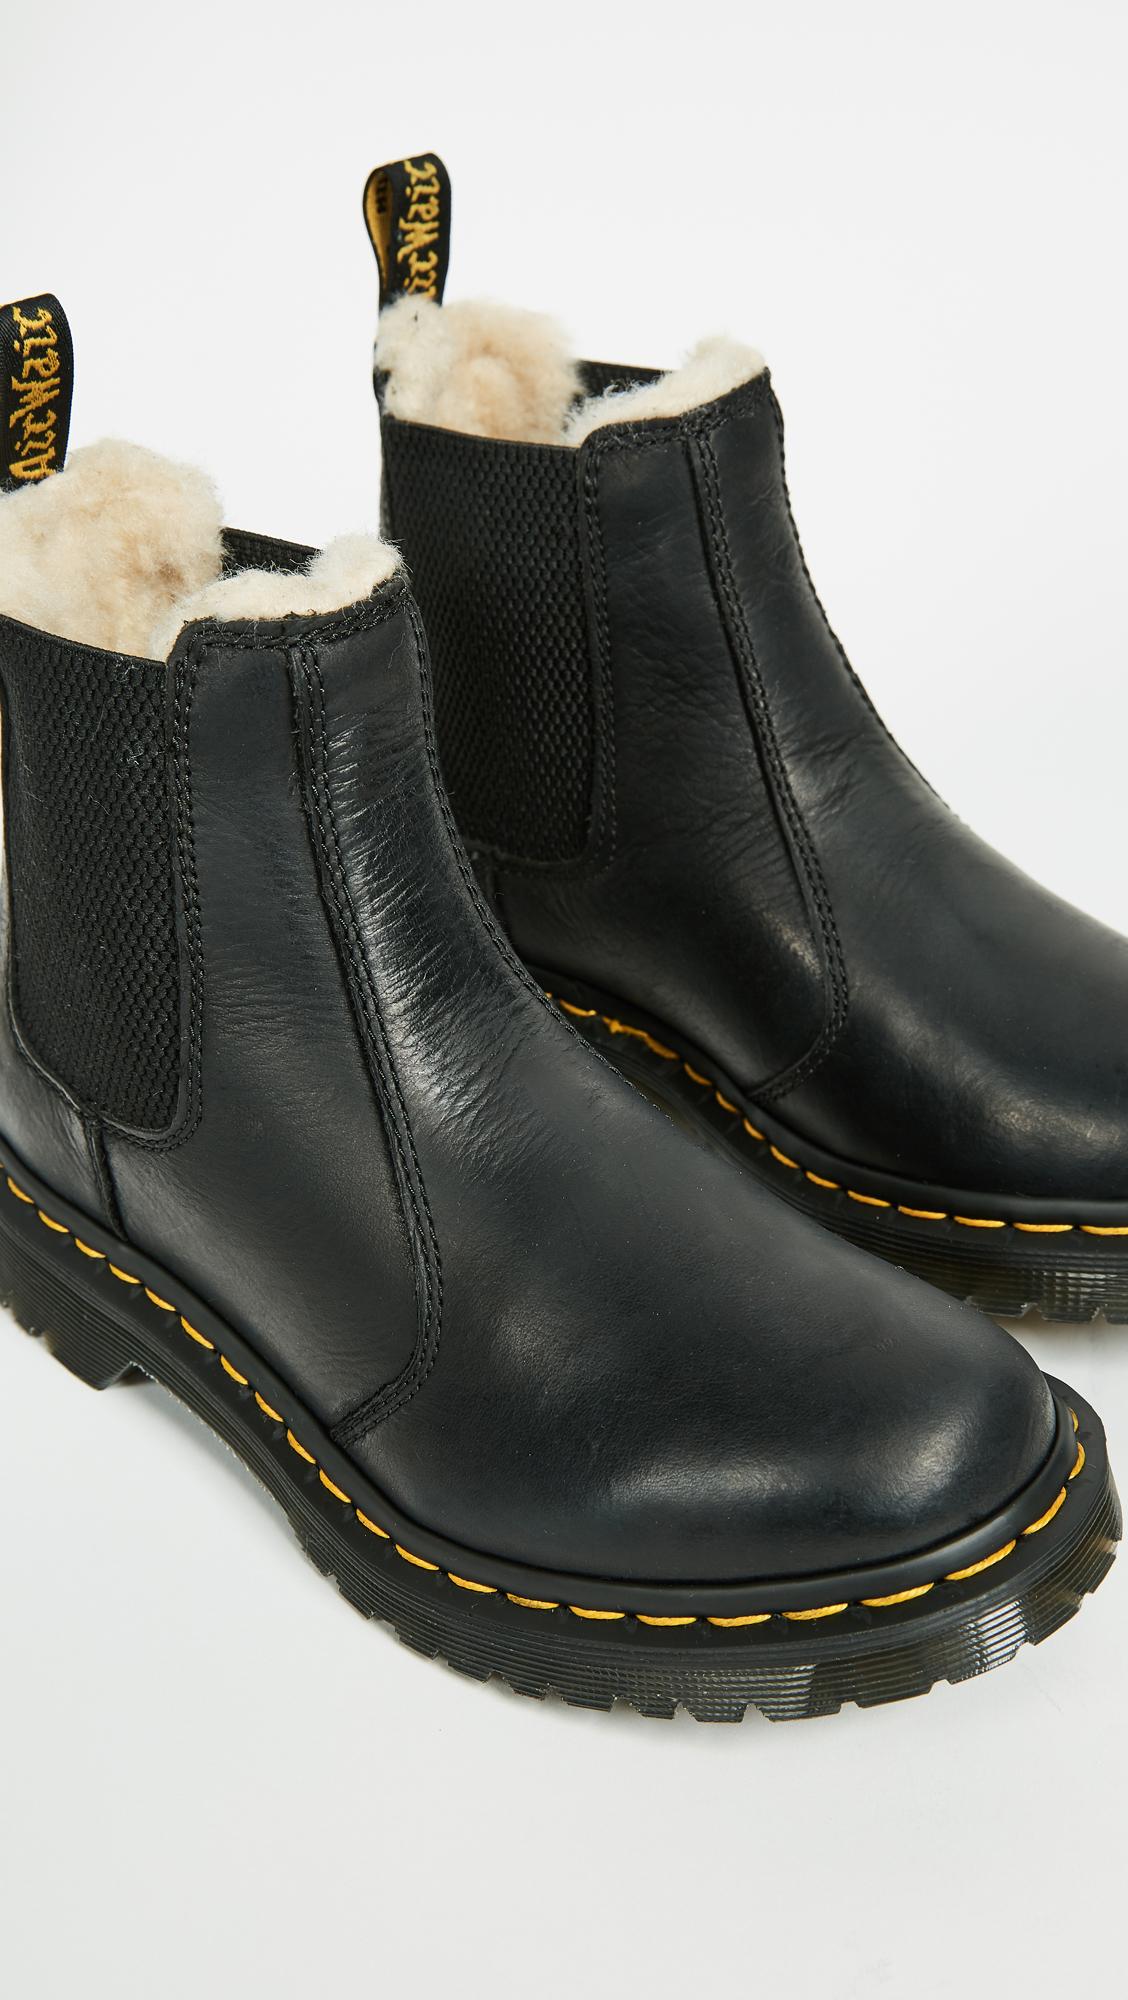 Dr martens new Chelsea fur lined boots Leonore Depop